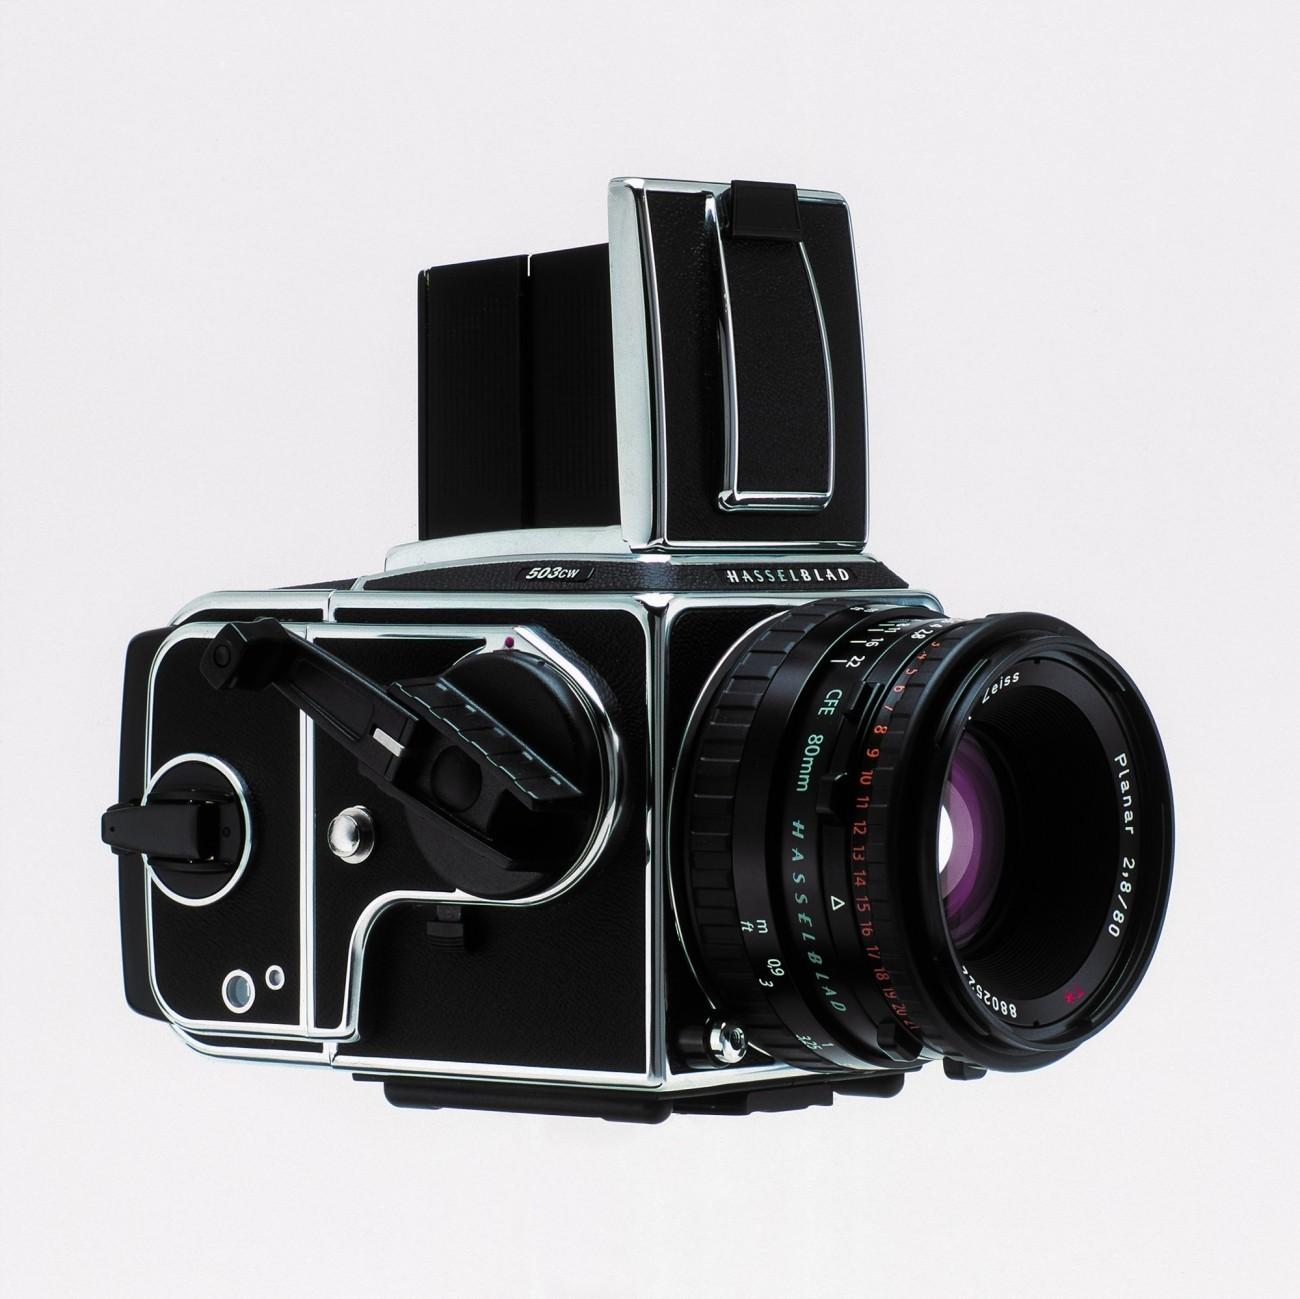 Hasselblad-503CW.jpg